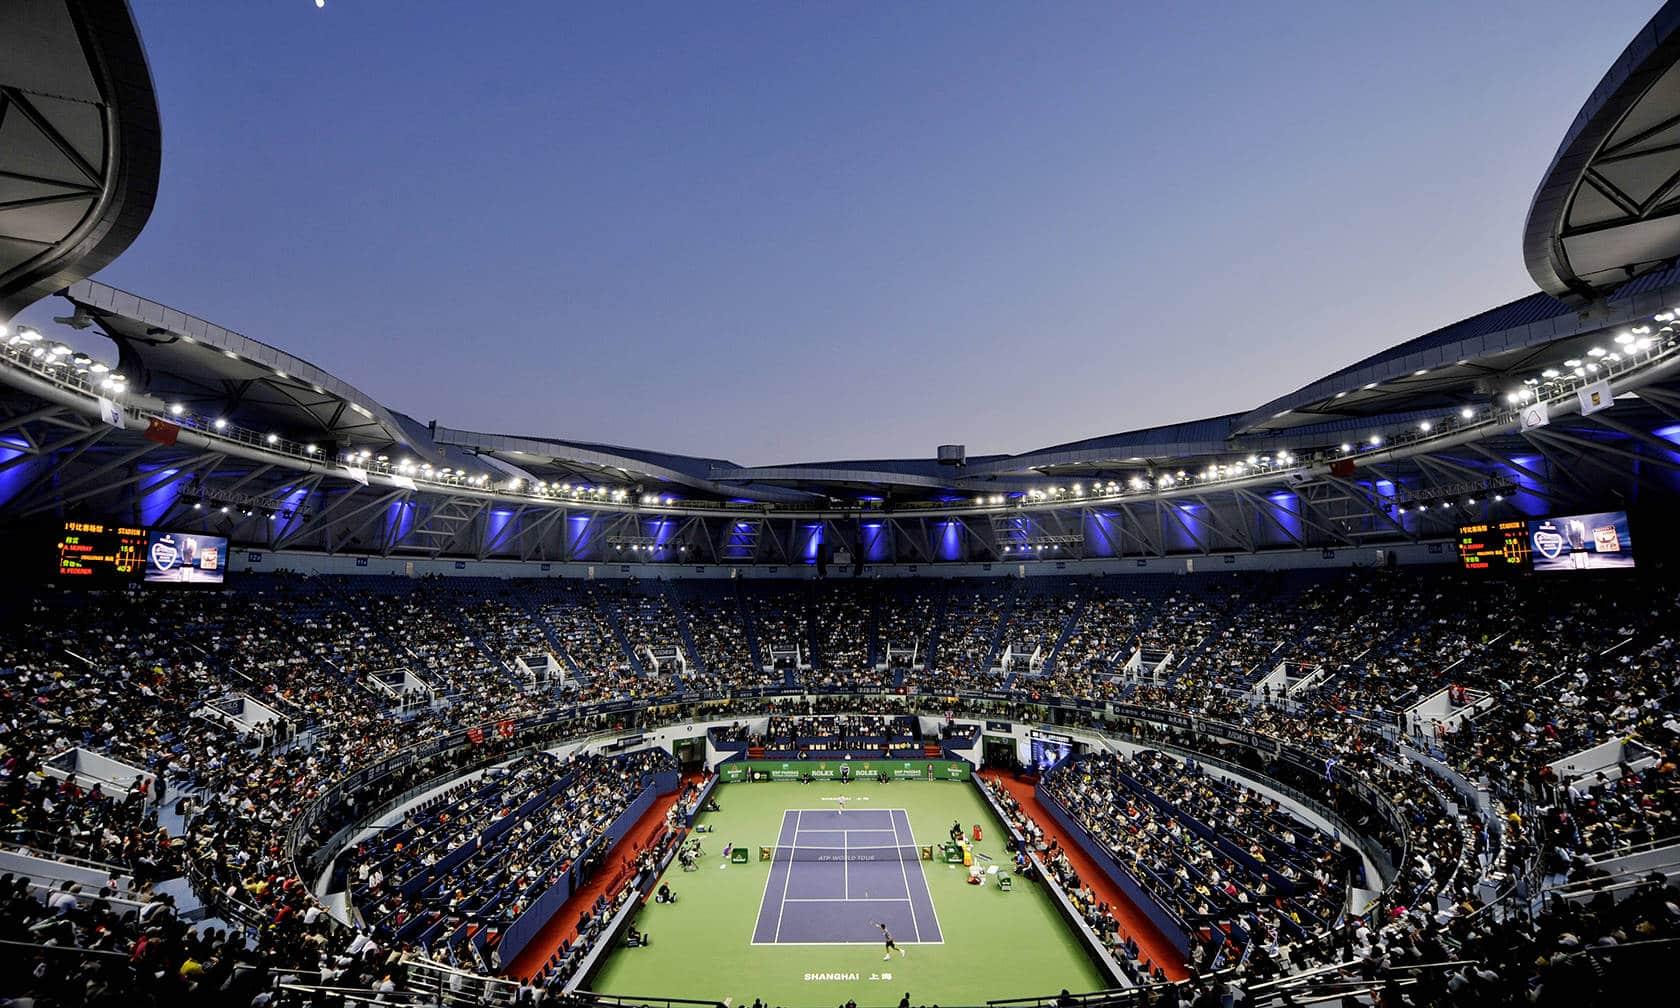 Shanghai Open